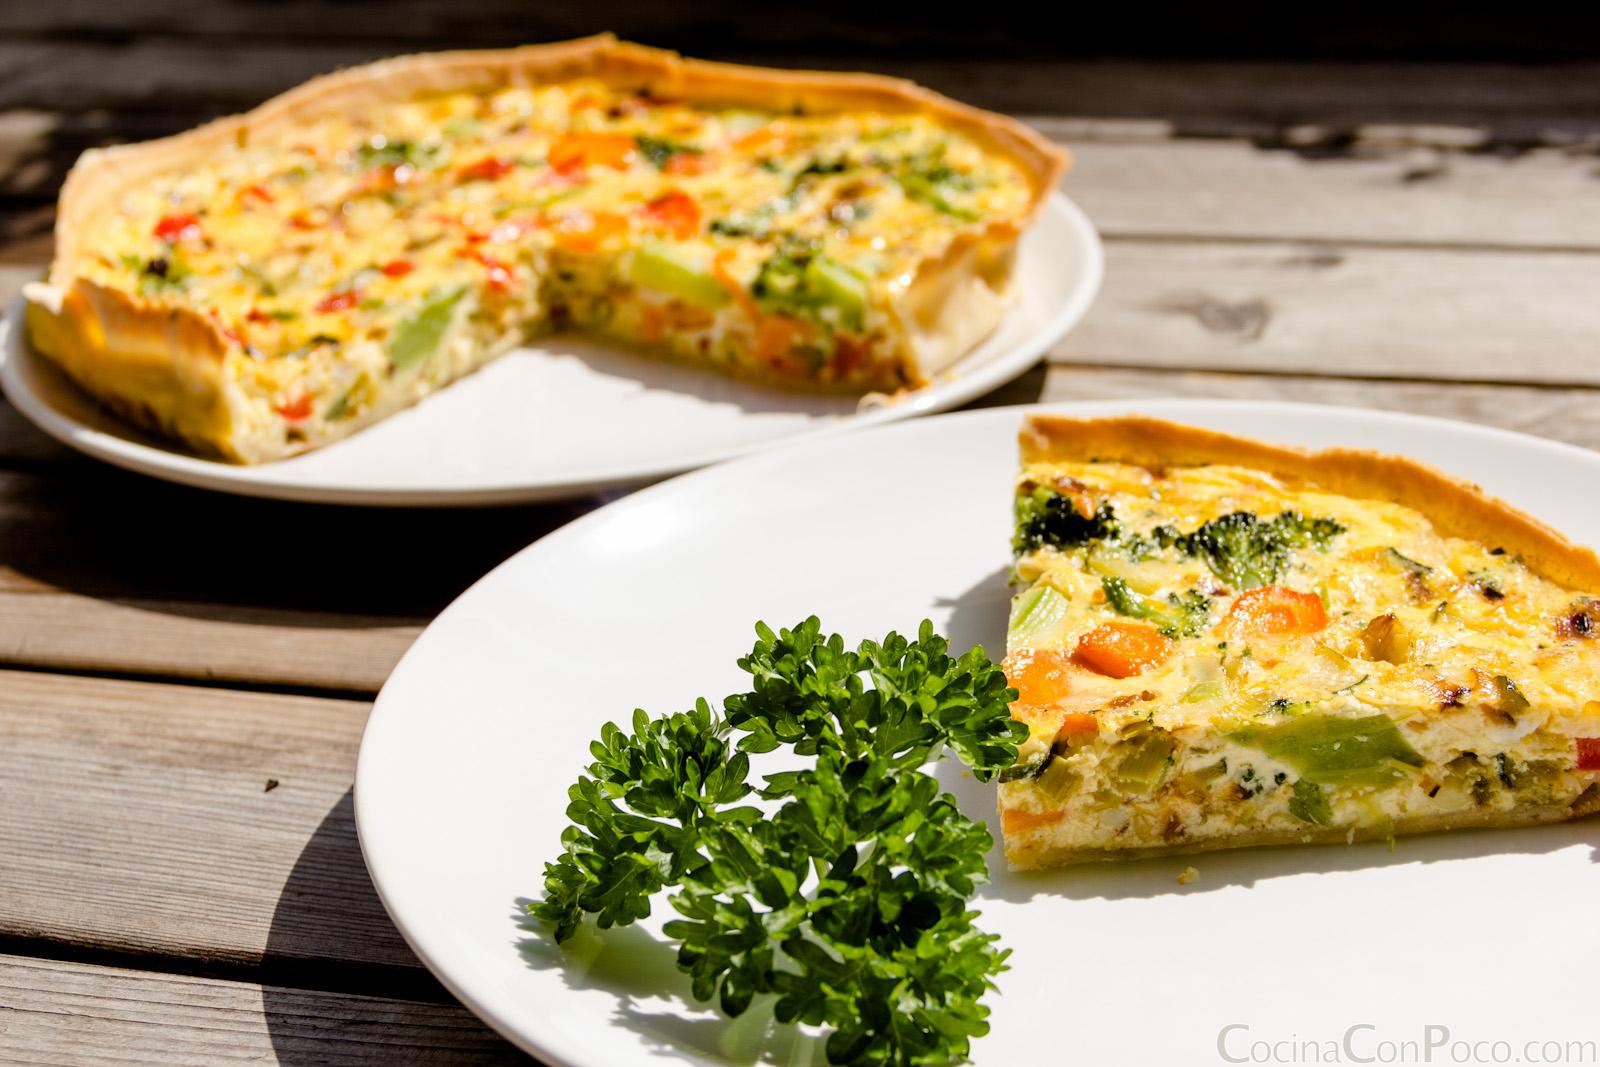 La cocina facil quiche de verduras sin gluten for Quiche de verduras facil